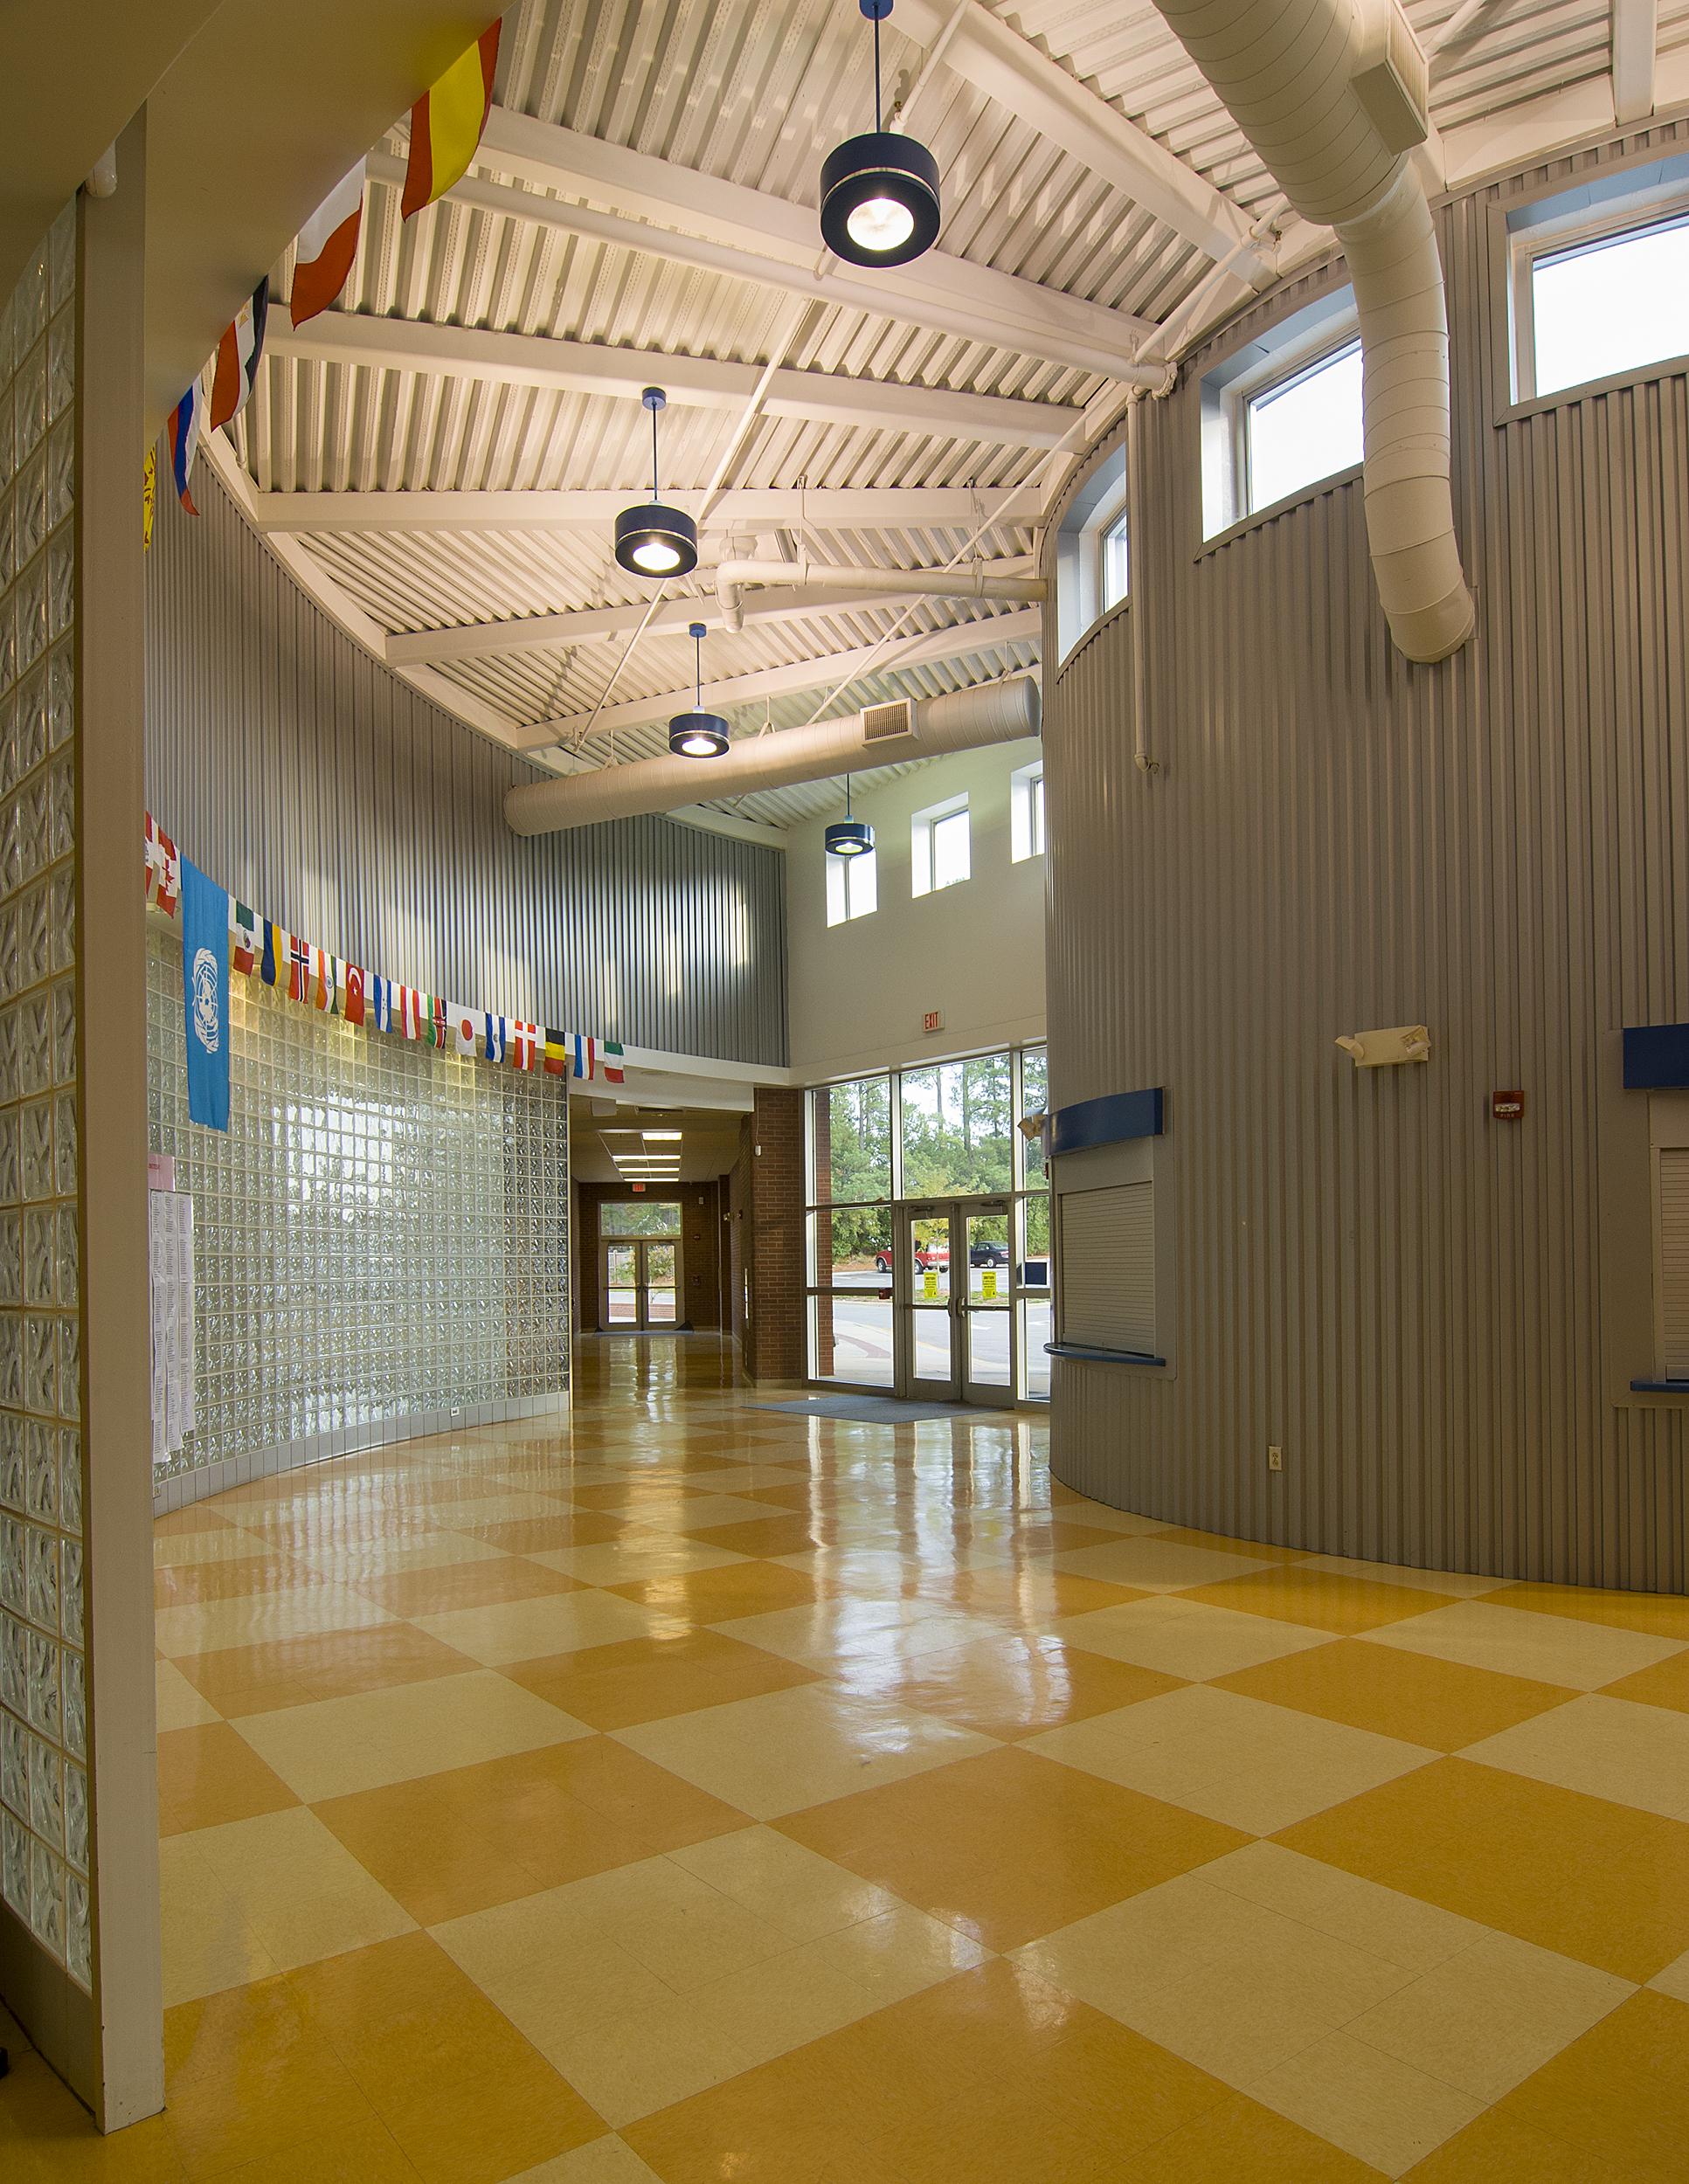 North Garner Middle School